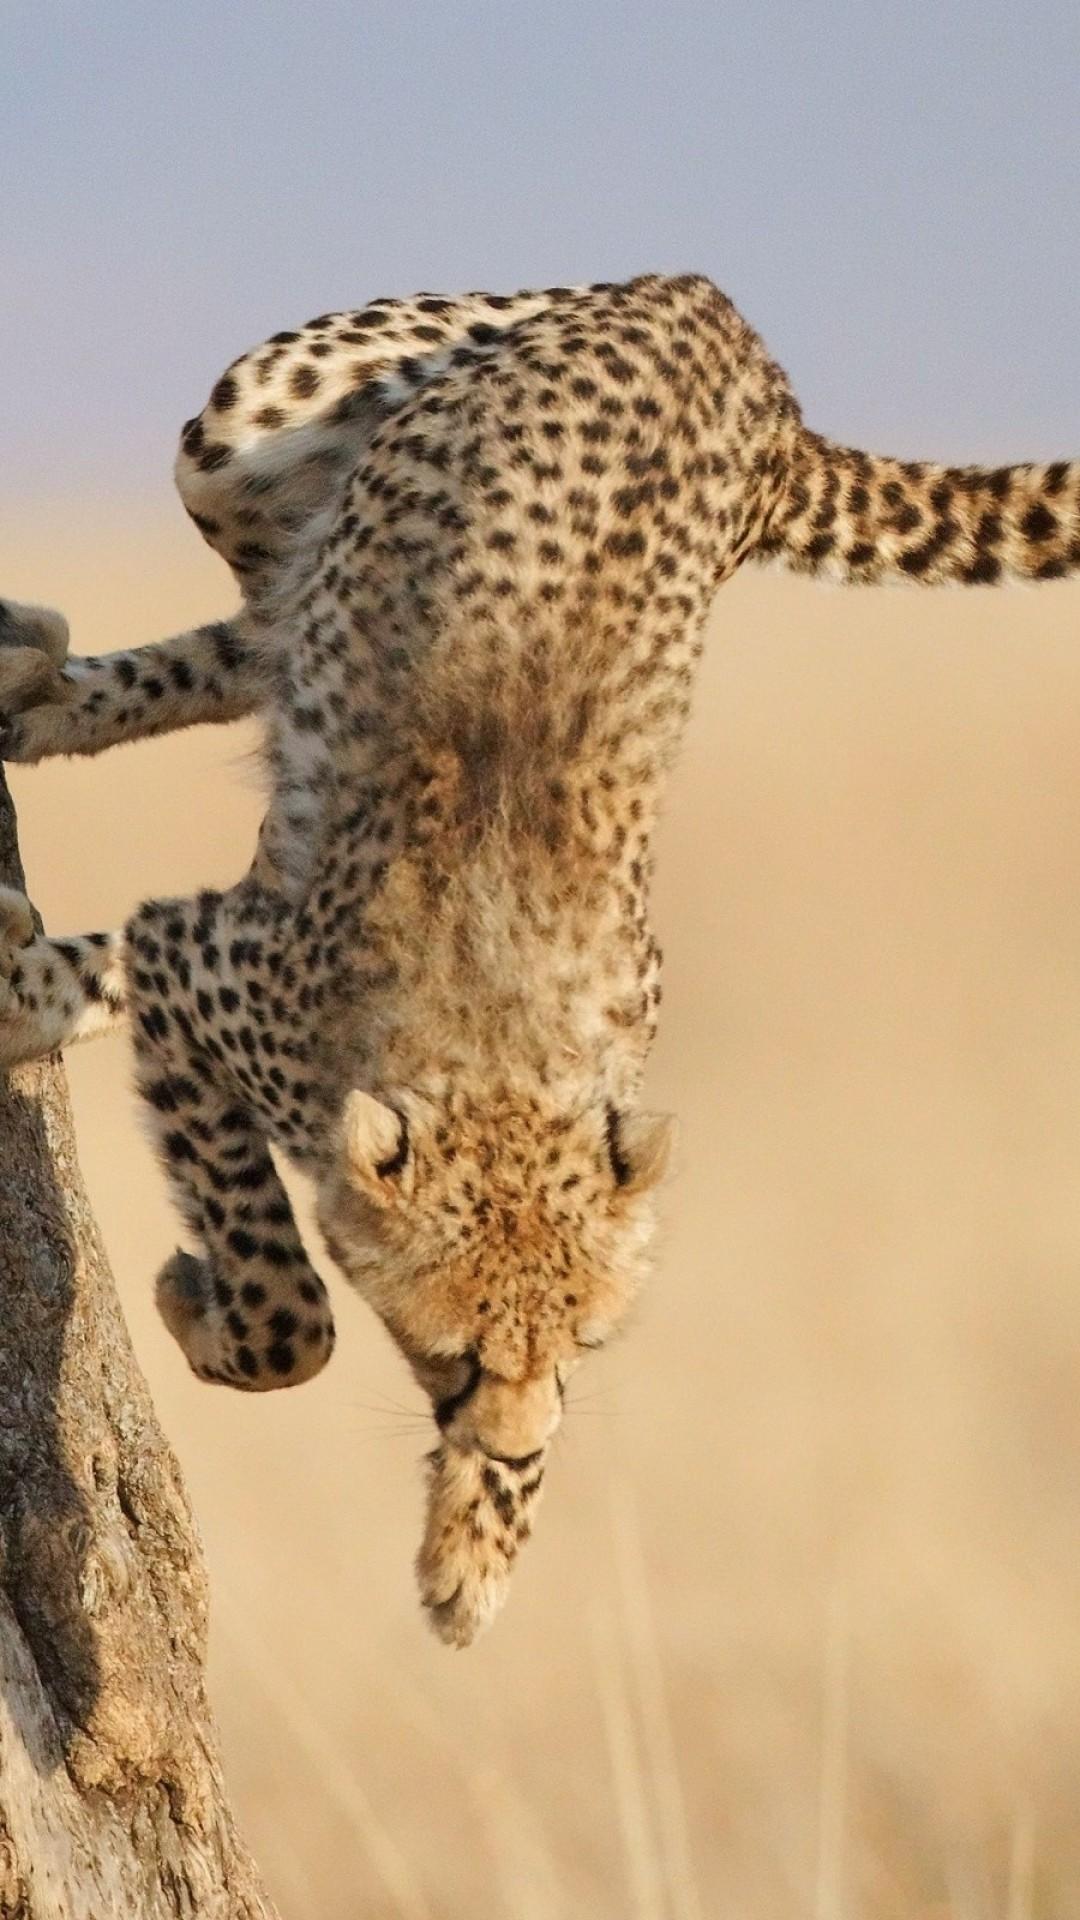 Cheetah background 68 images 1920x1080 1920x1080 running cheetah wallpaper voltagebd Choice Image